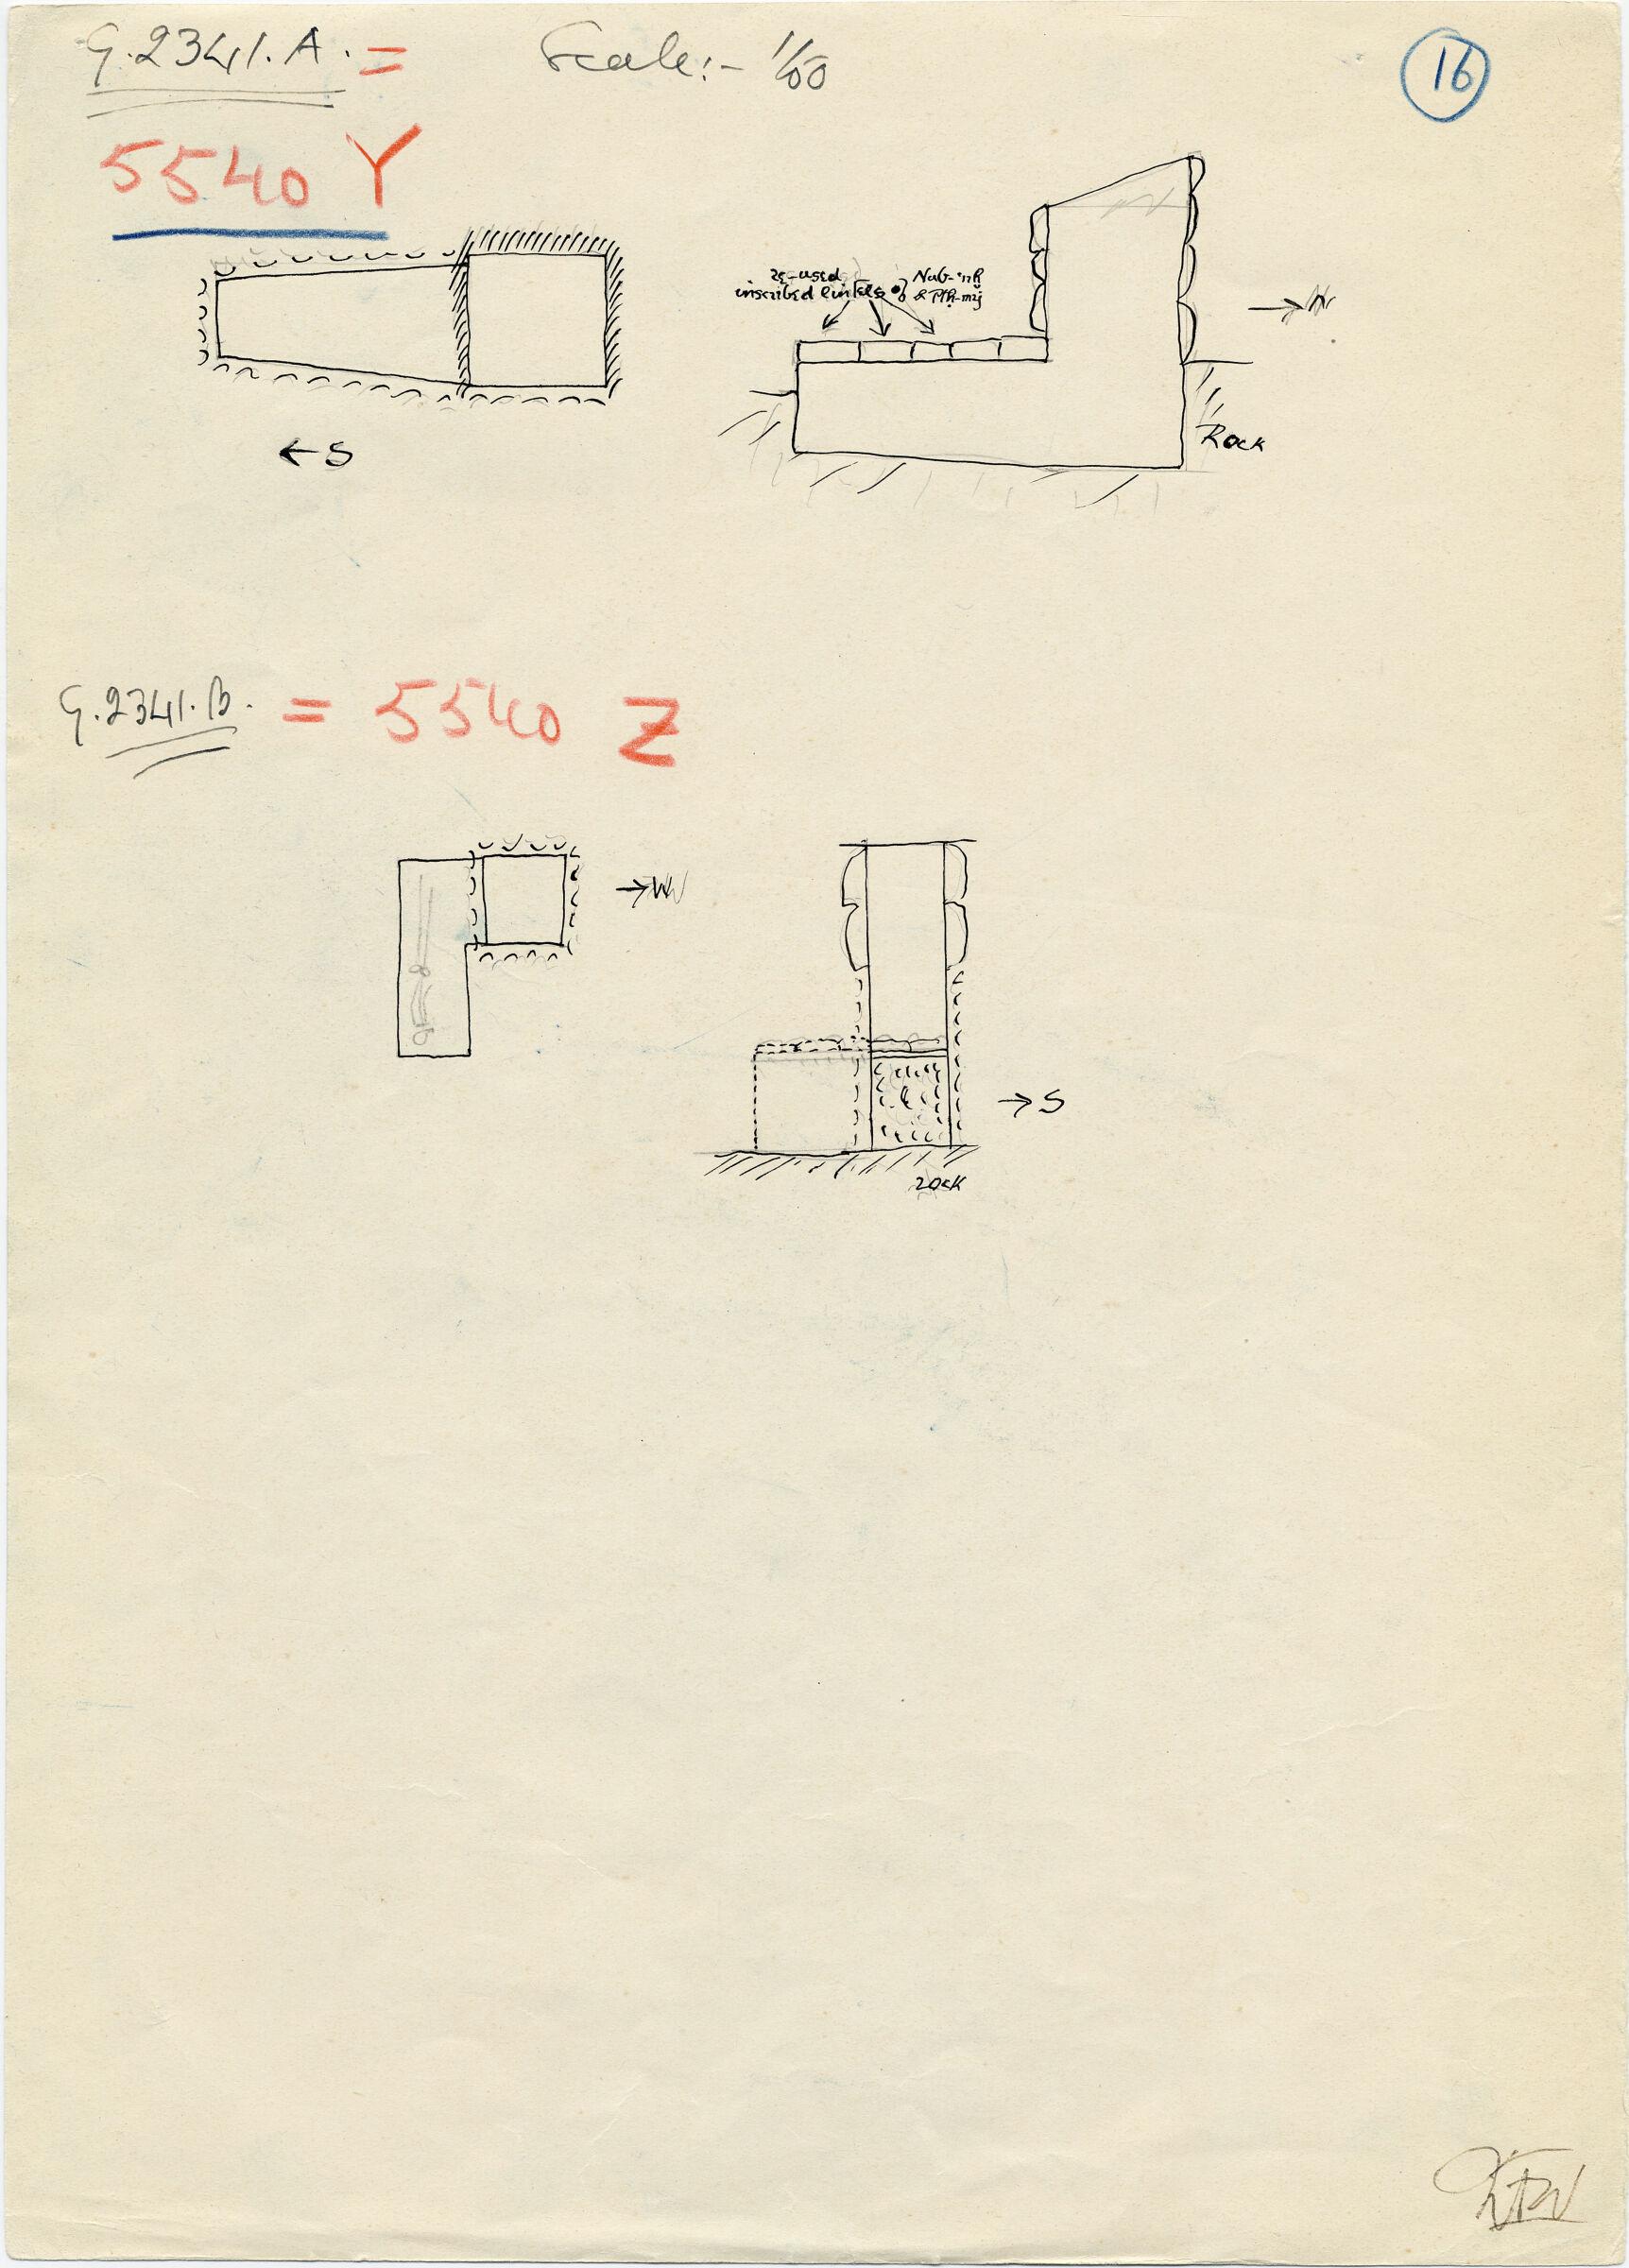 Maps and plans: G 2341 A = G 5540, Shaft Y; G 2341 B = G 5540, Shaft Z